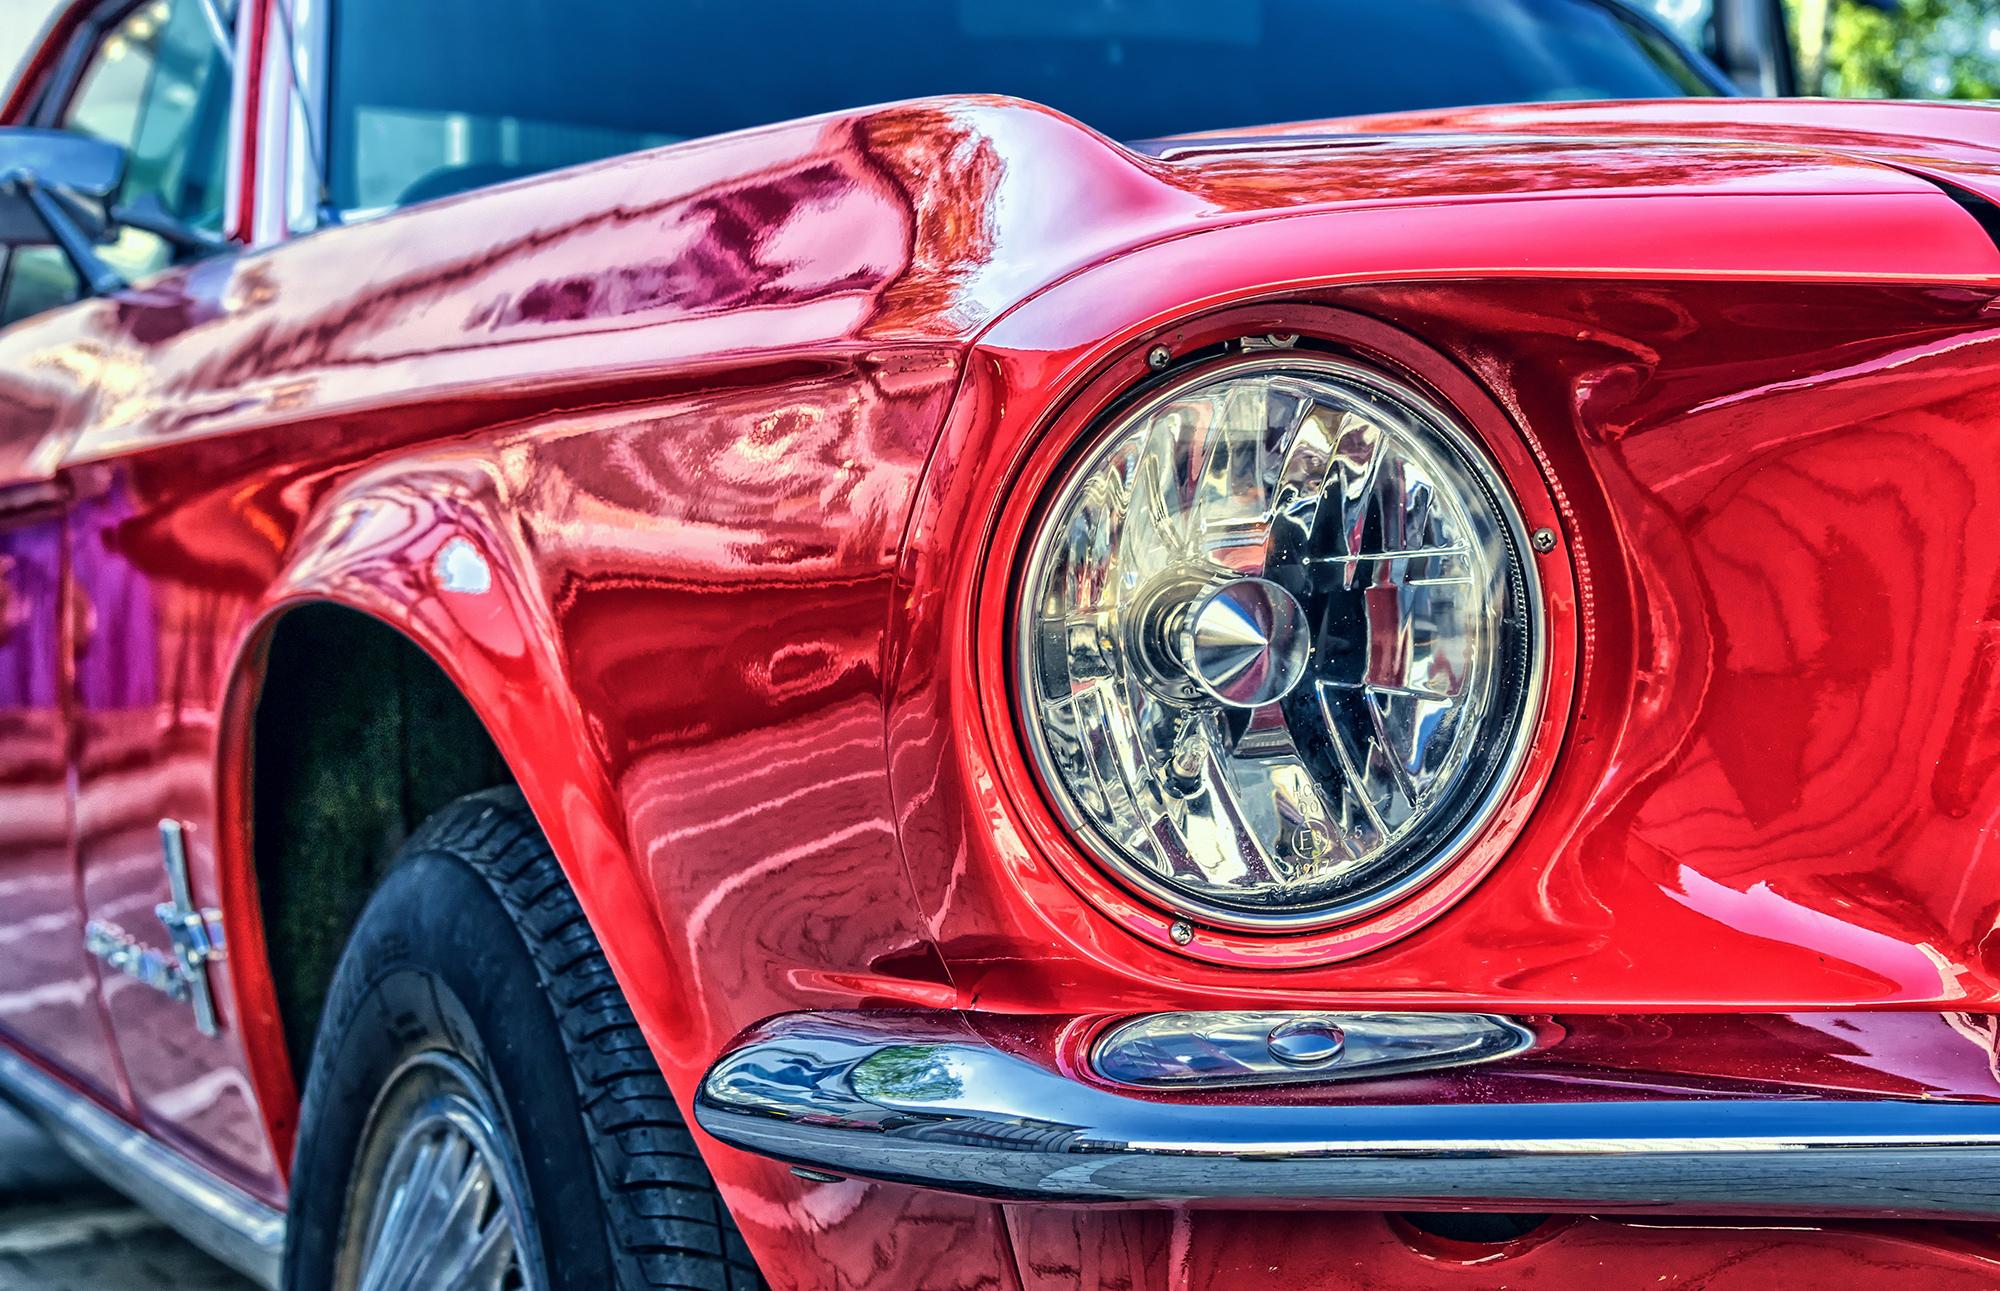 Red car at headlight